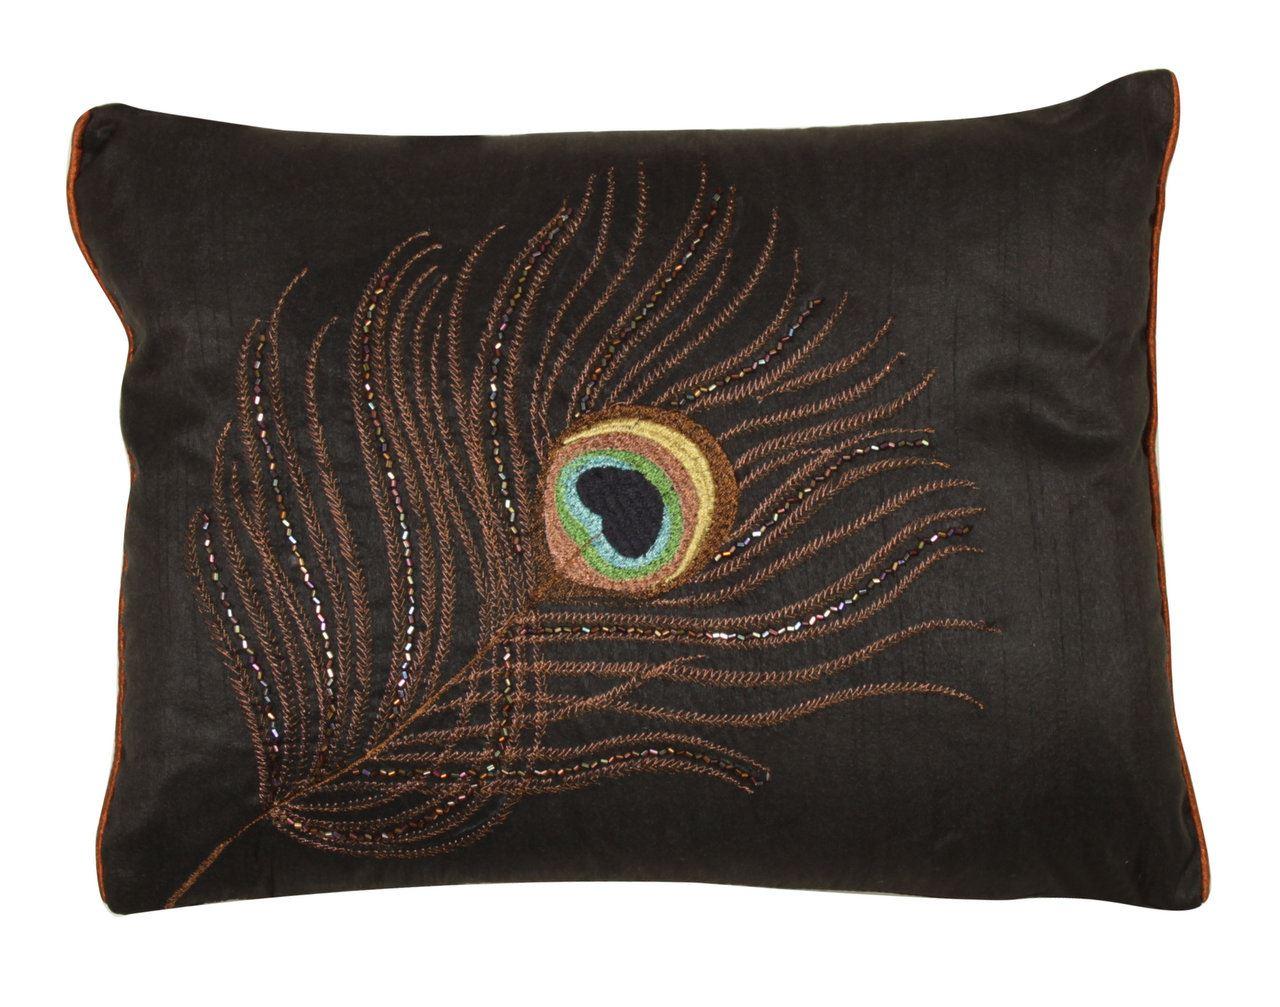 Black Sequin Small Cushion Peacock Feather Design Rectangular